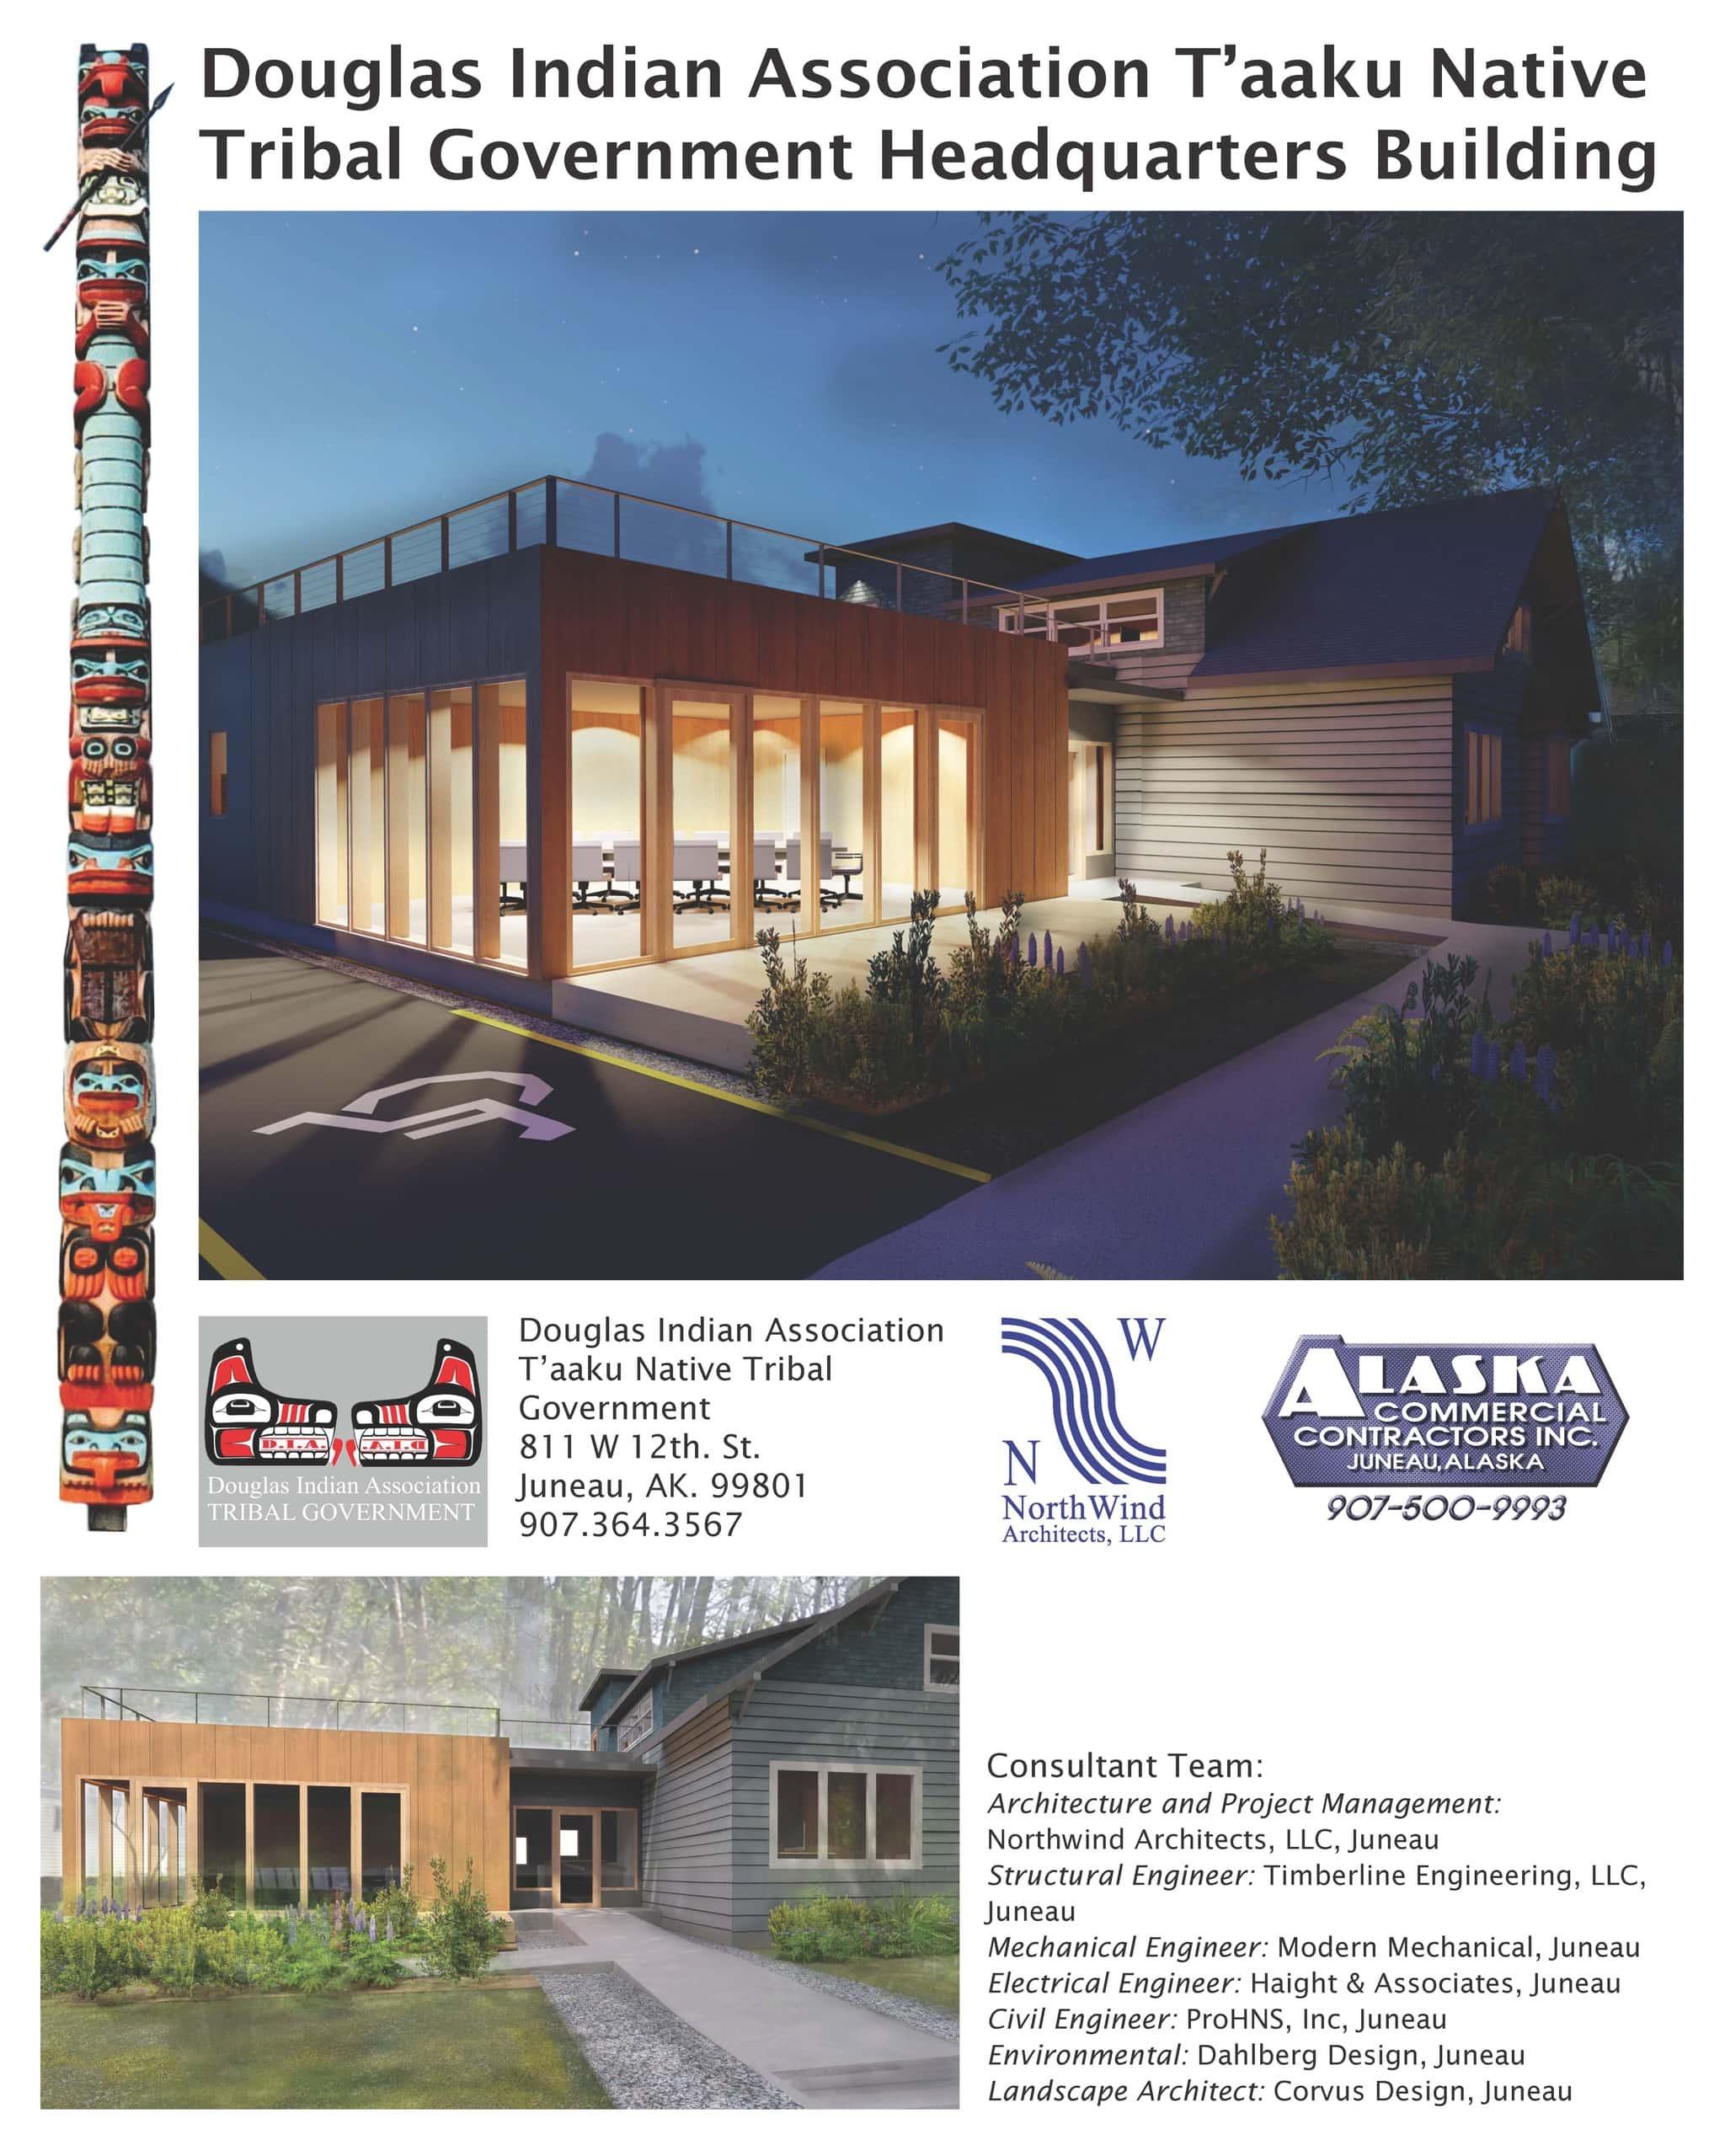 Douglas Indian Association Taaku Native Tribal Government Headquarters Building